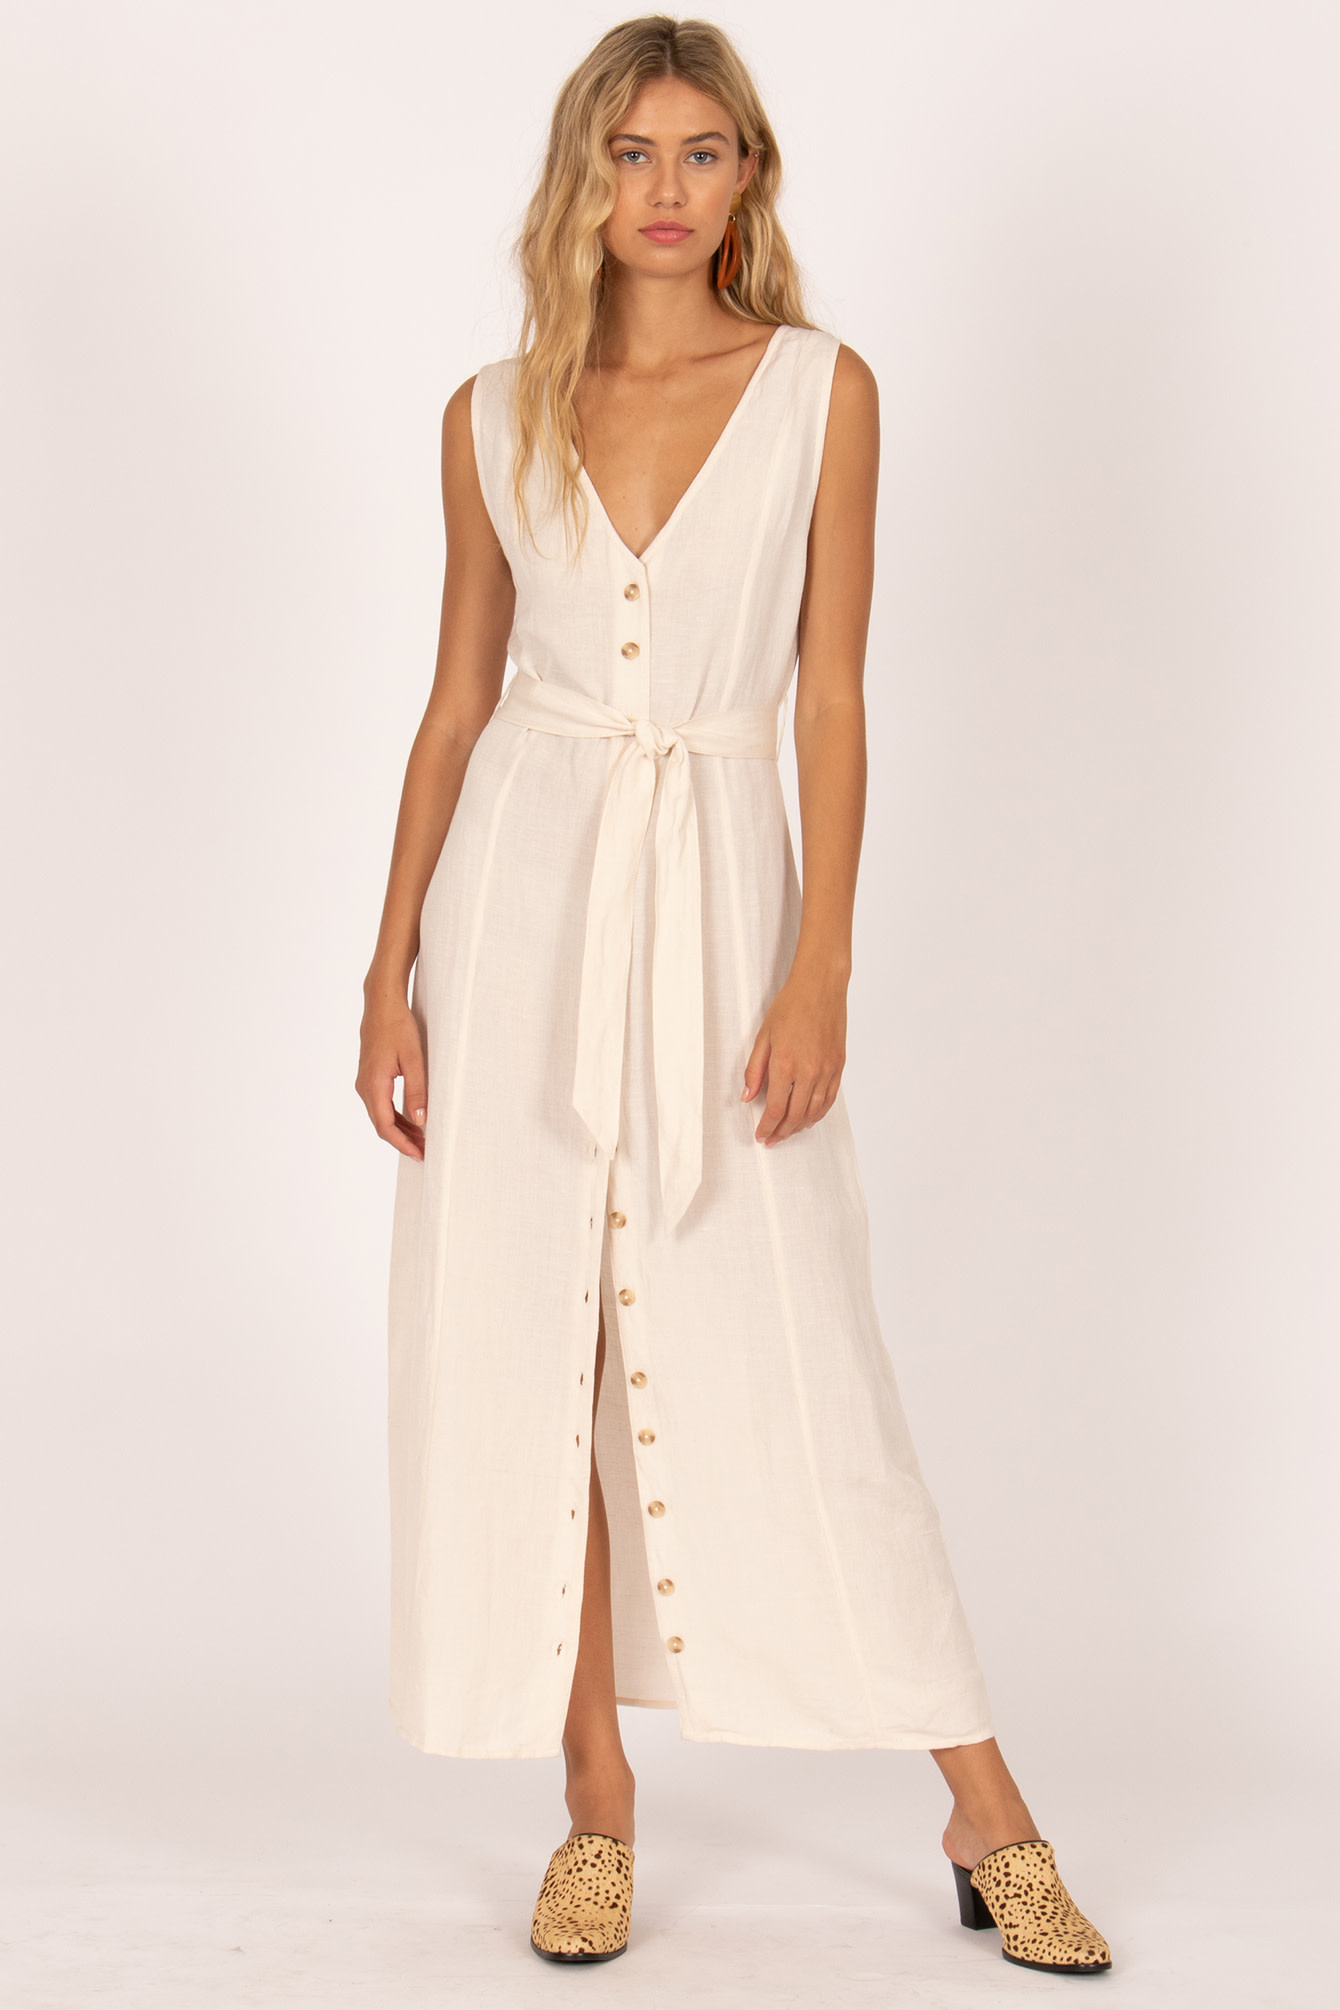 Amuse Society Casablanca Dress